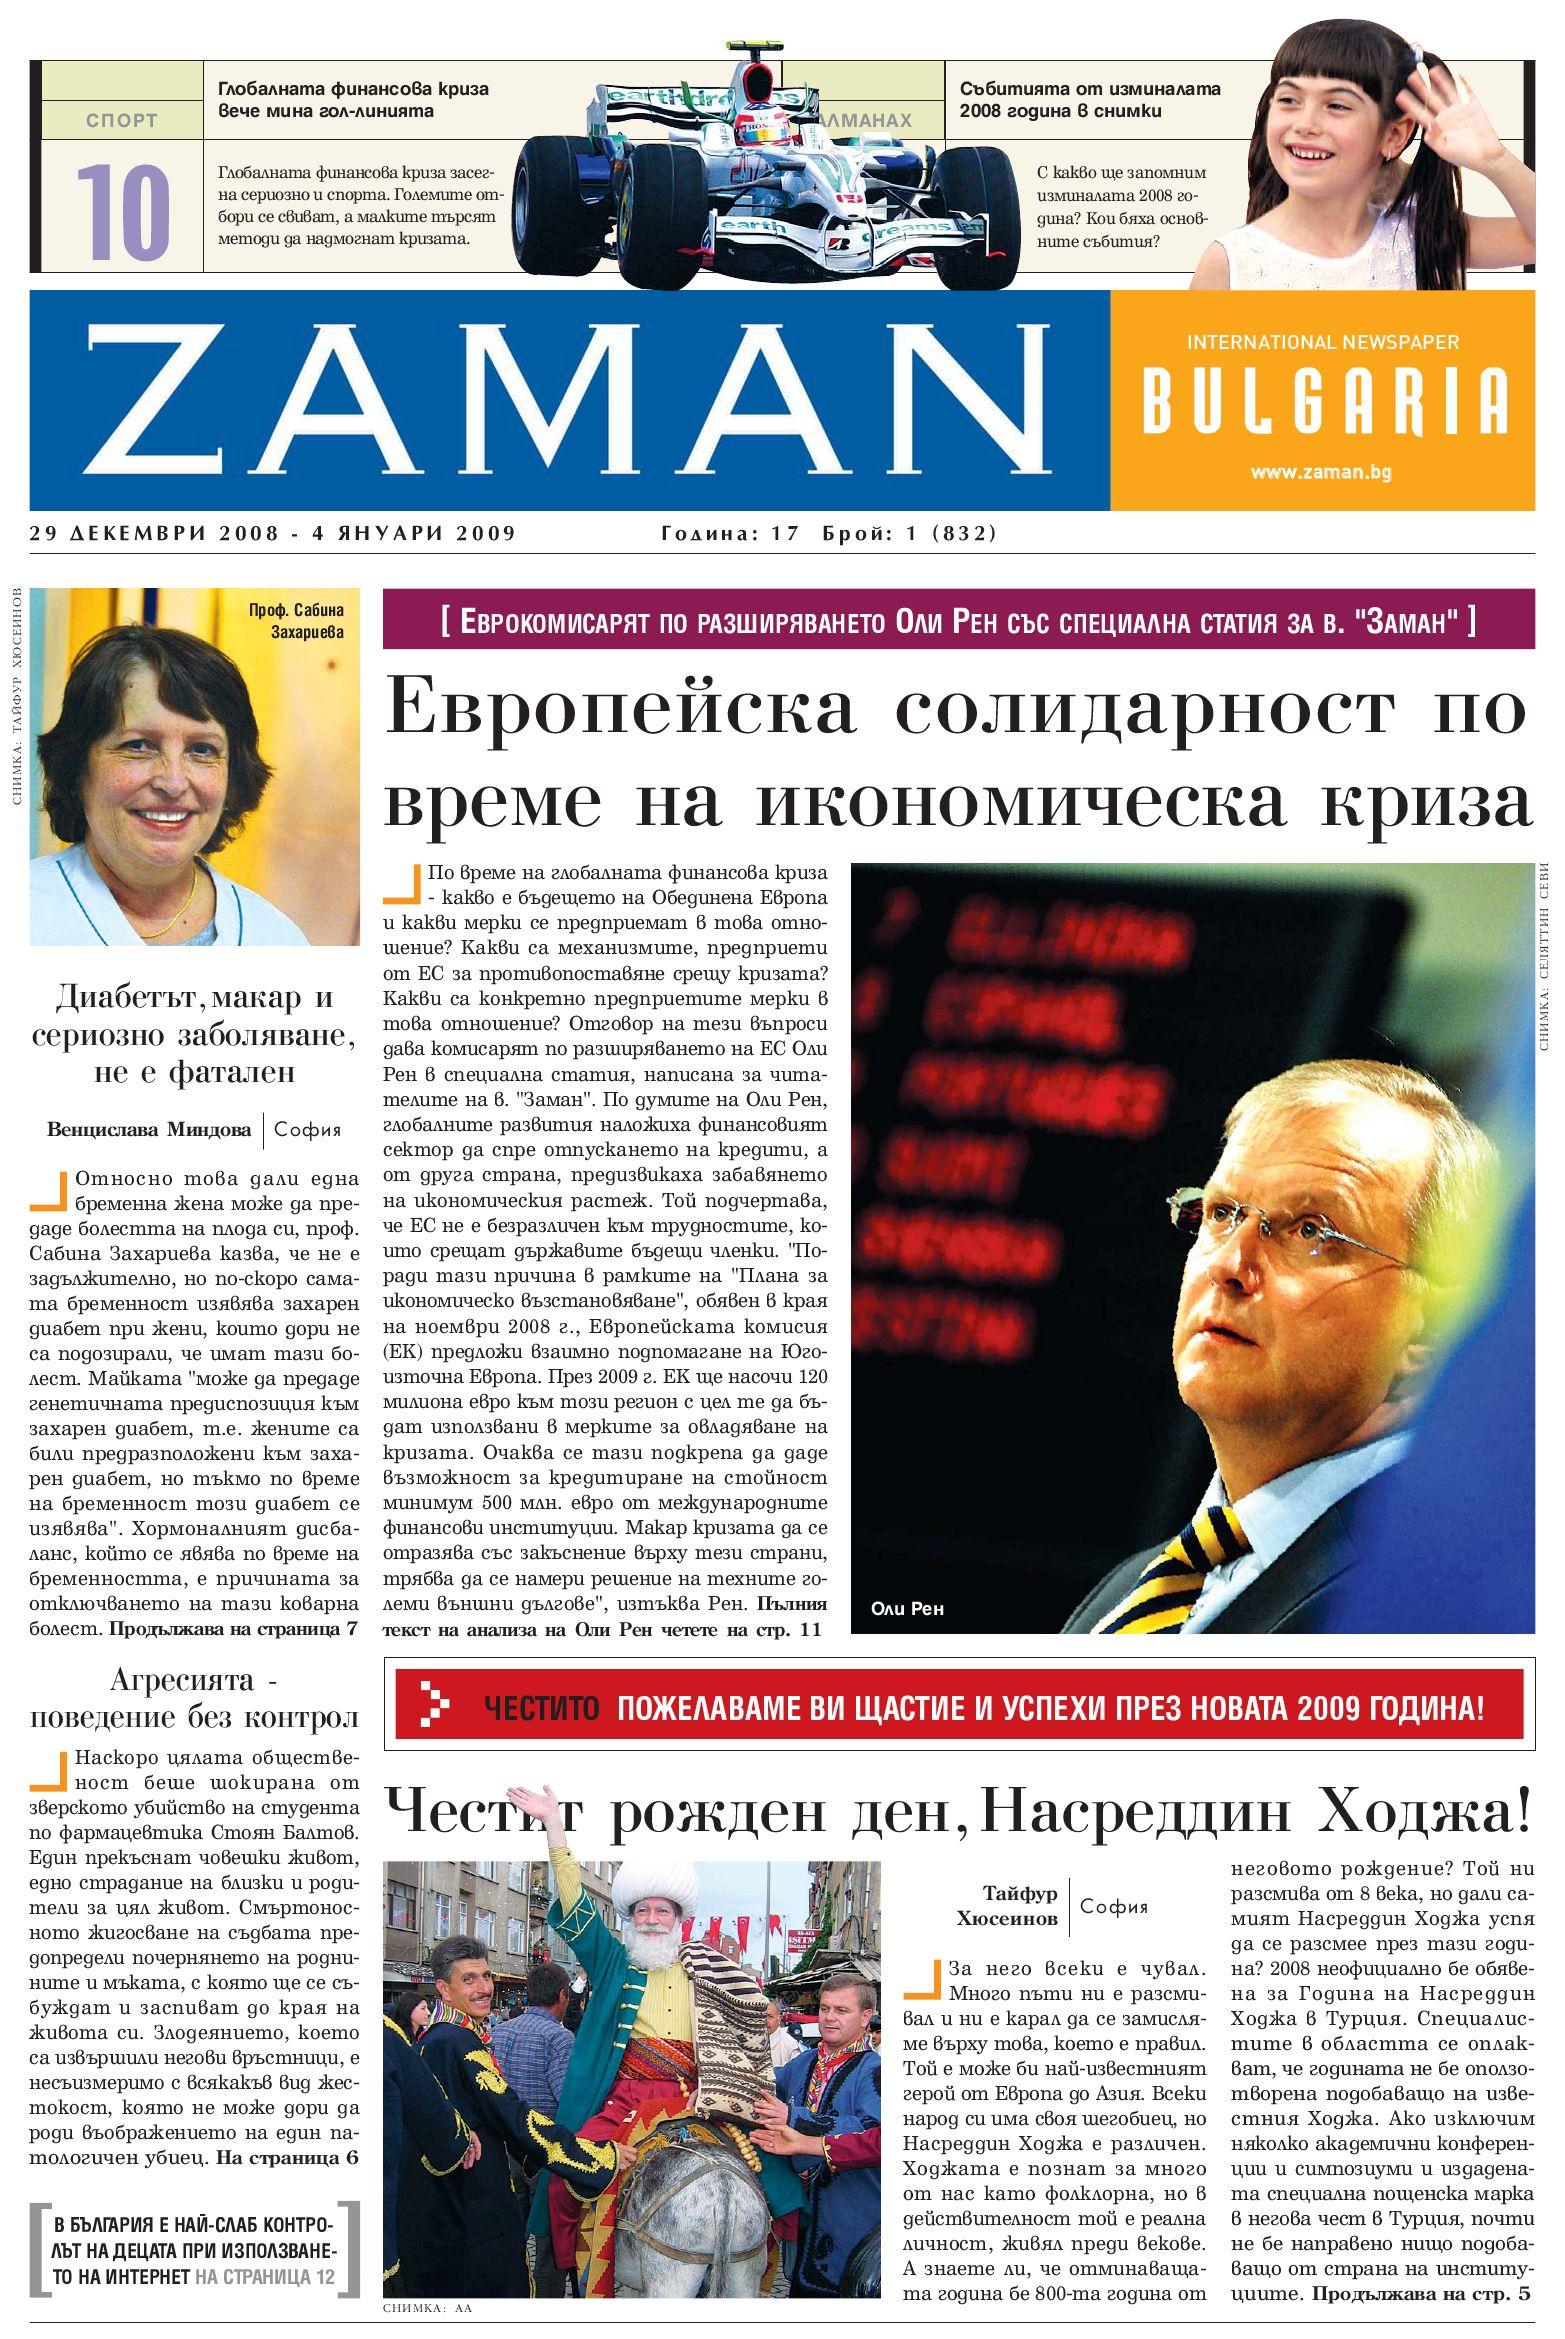 Zaman Bulgaristan 29 Aralik 2008 By Zaman Bulgaristan Issuu